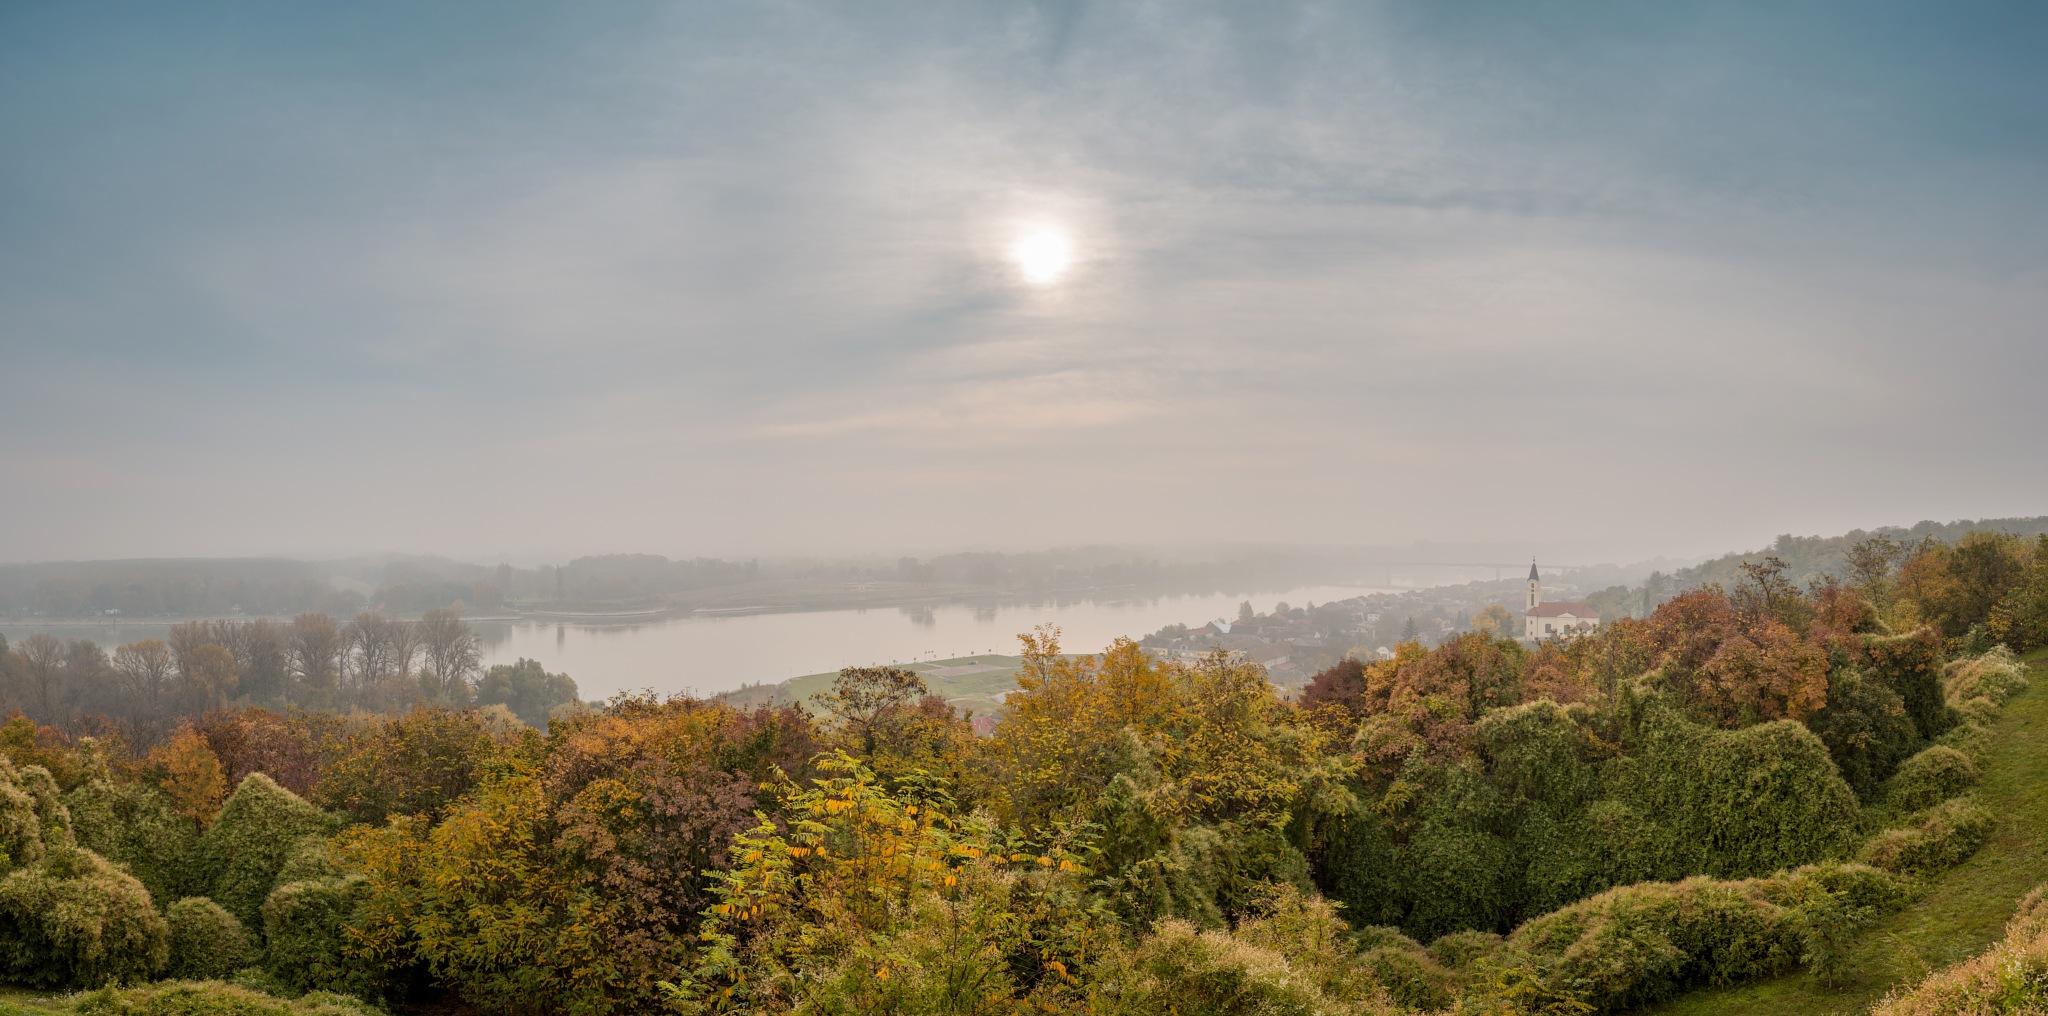 Batina on the Danube-Panorama by Nenad Milic